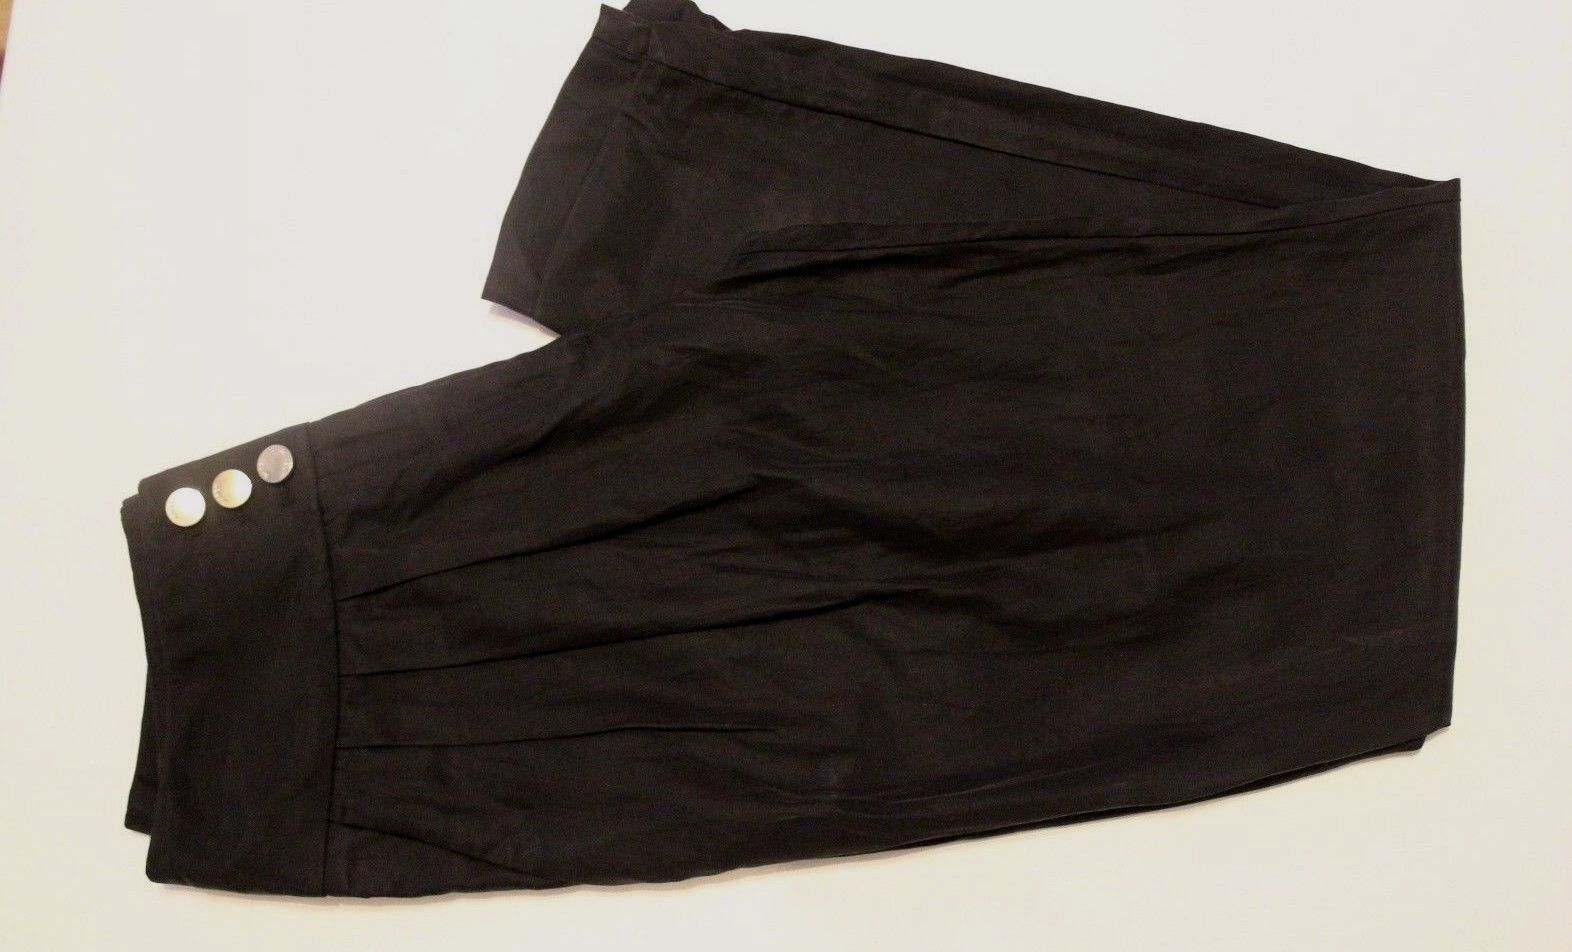 Karen Millen Nero Pulsante Pleat Harem Harem Harem drappo di cotone Relax Fit Pantaloni fc01a4